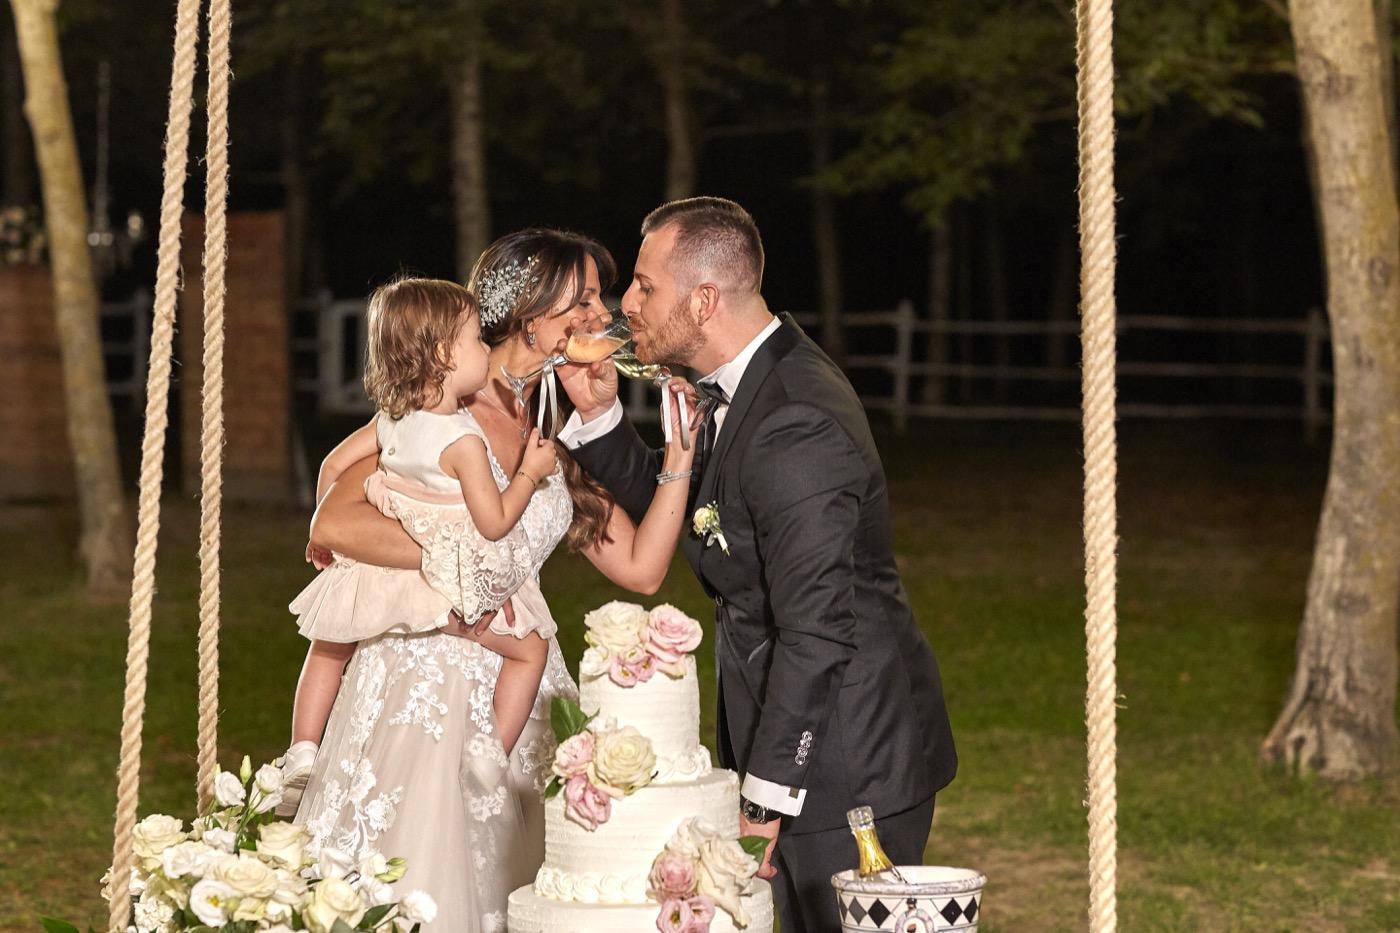 Claudio-Coppola-wedding-photographer-la-scuderia-eventi-preparativi-la-rosetta-perugia-93